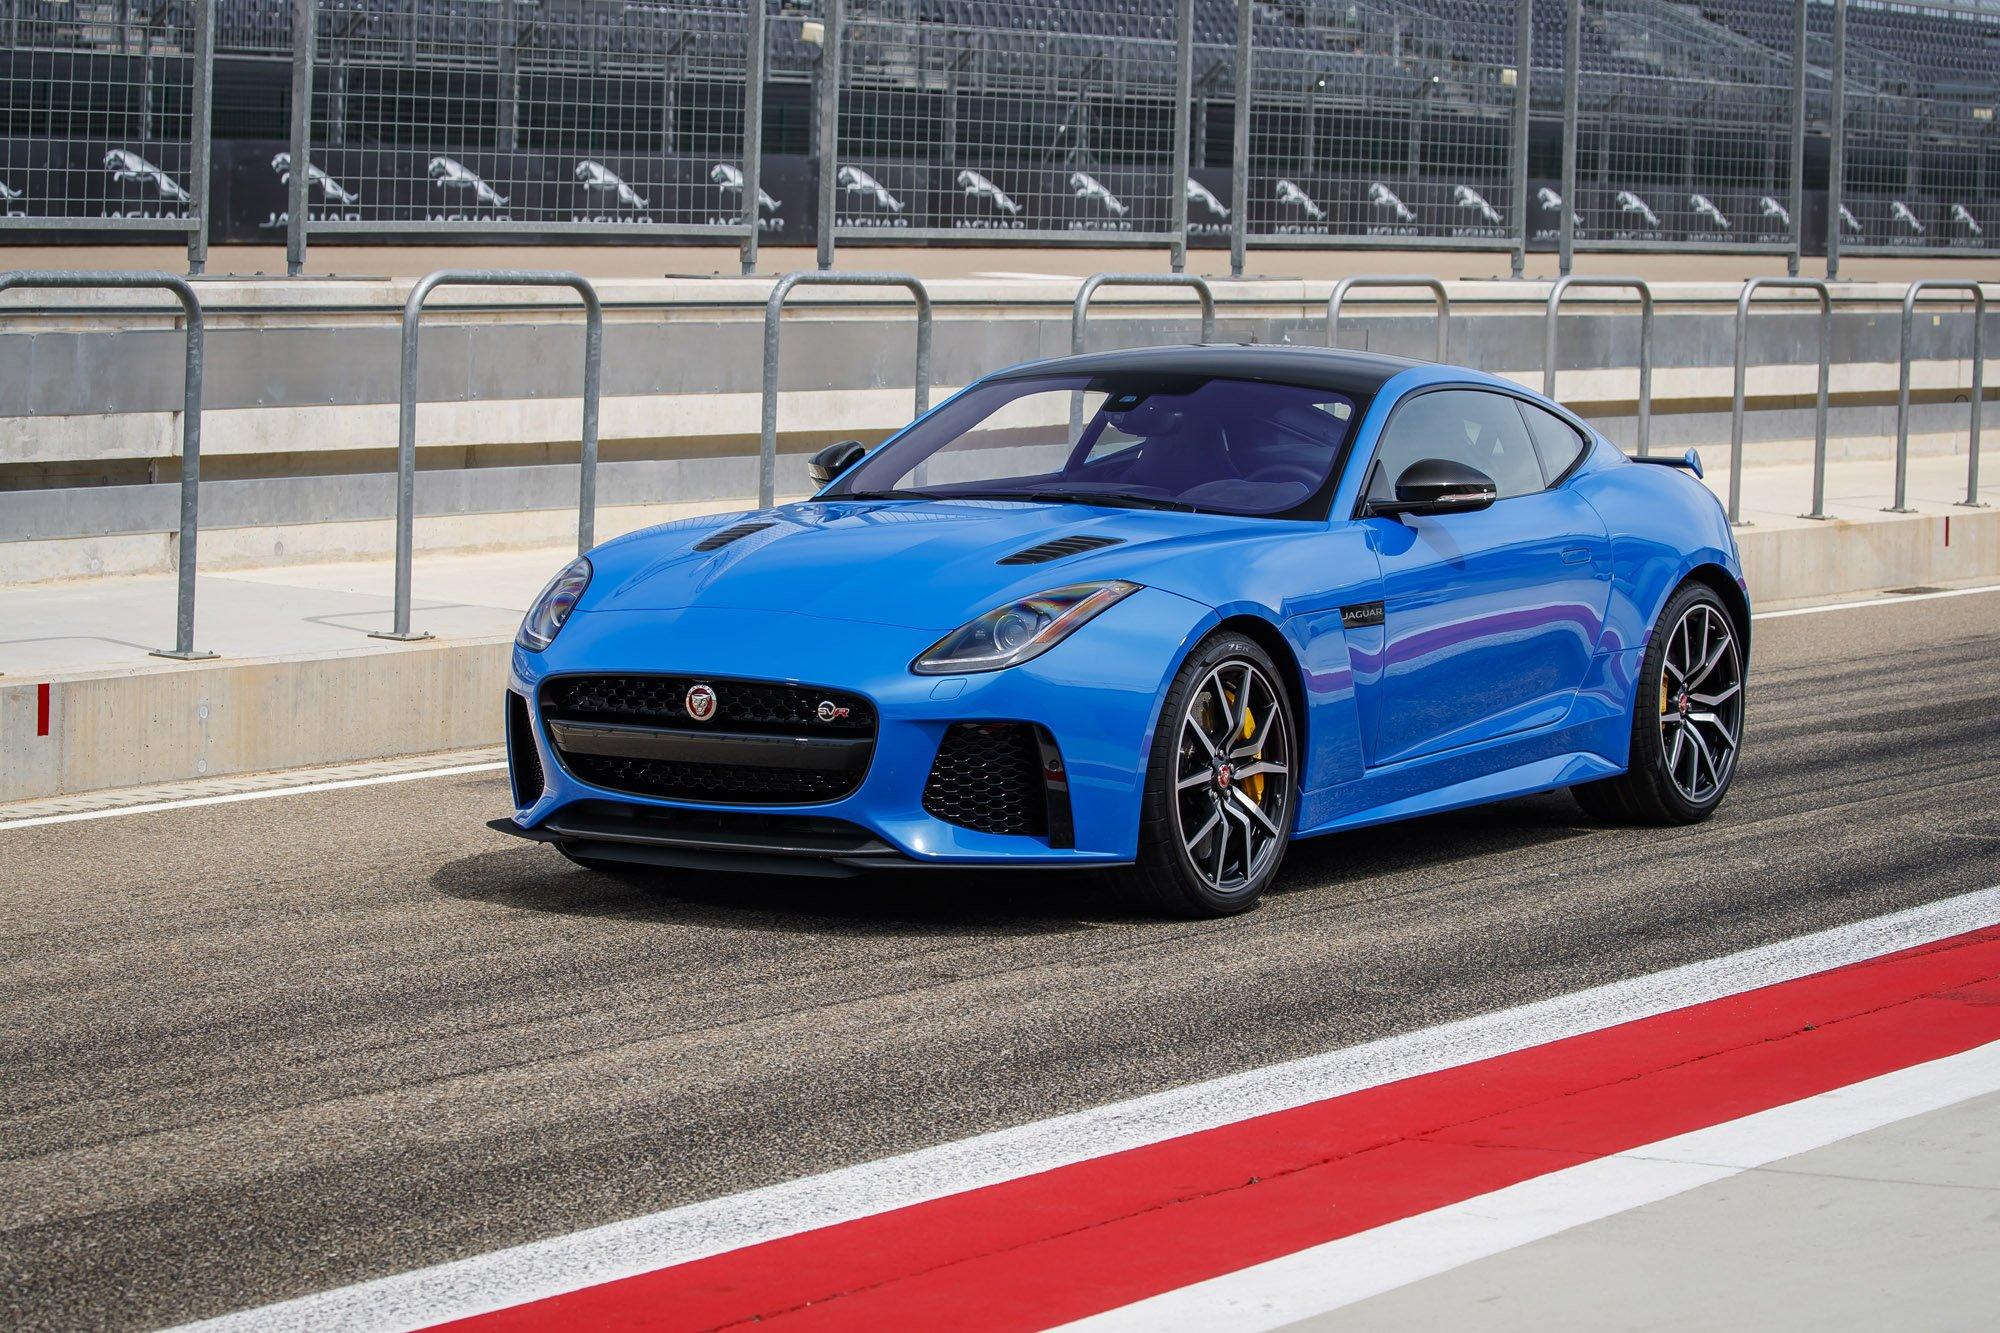 F Type Coupe >> 2017 Jaguar F-Type SVR Review - photos | CarAdvice